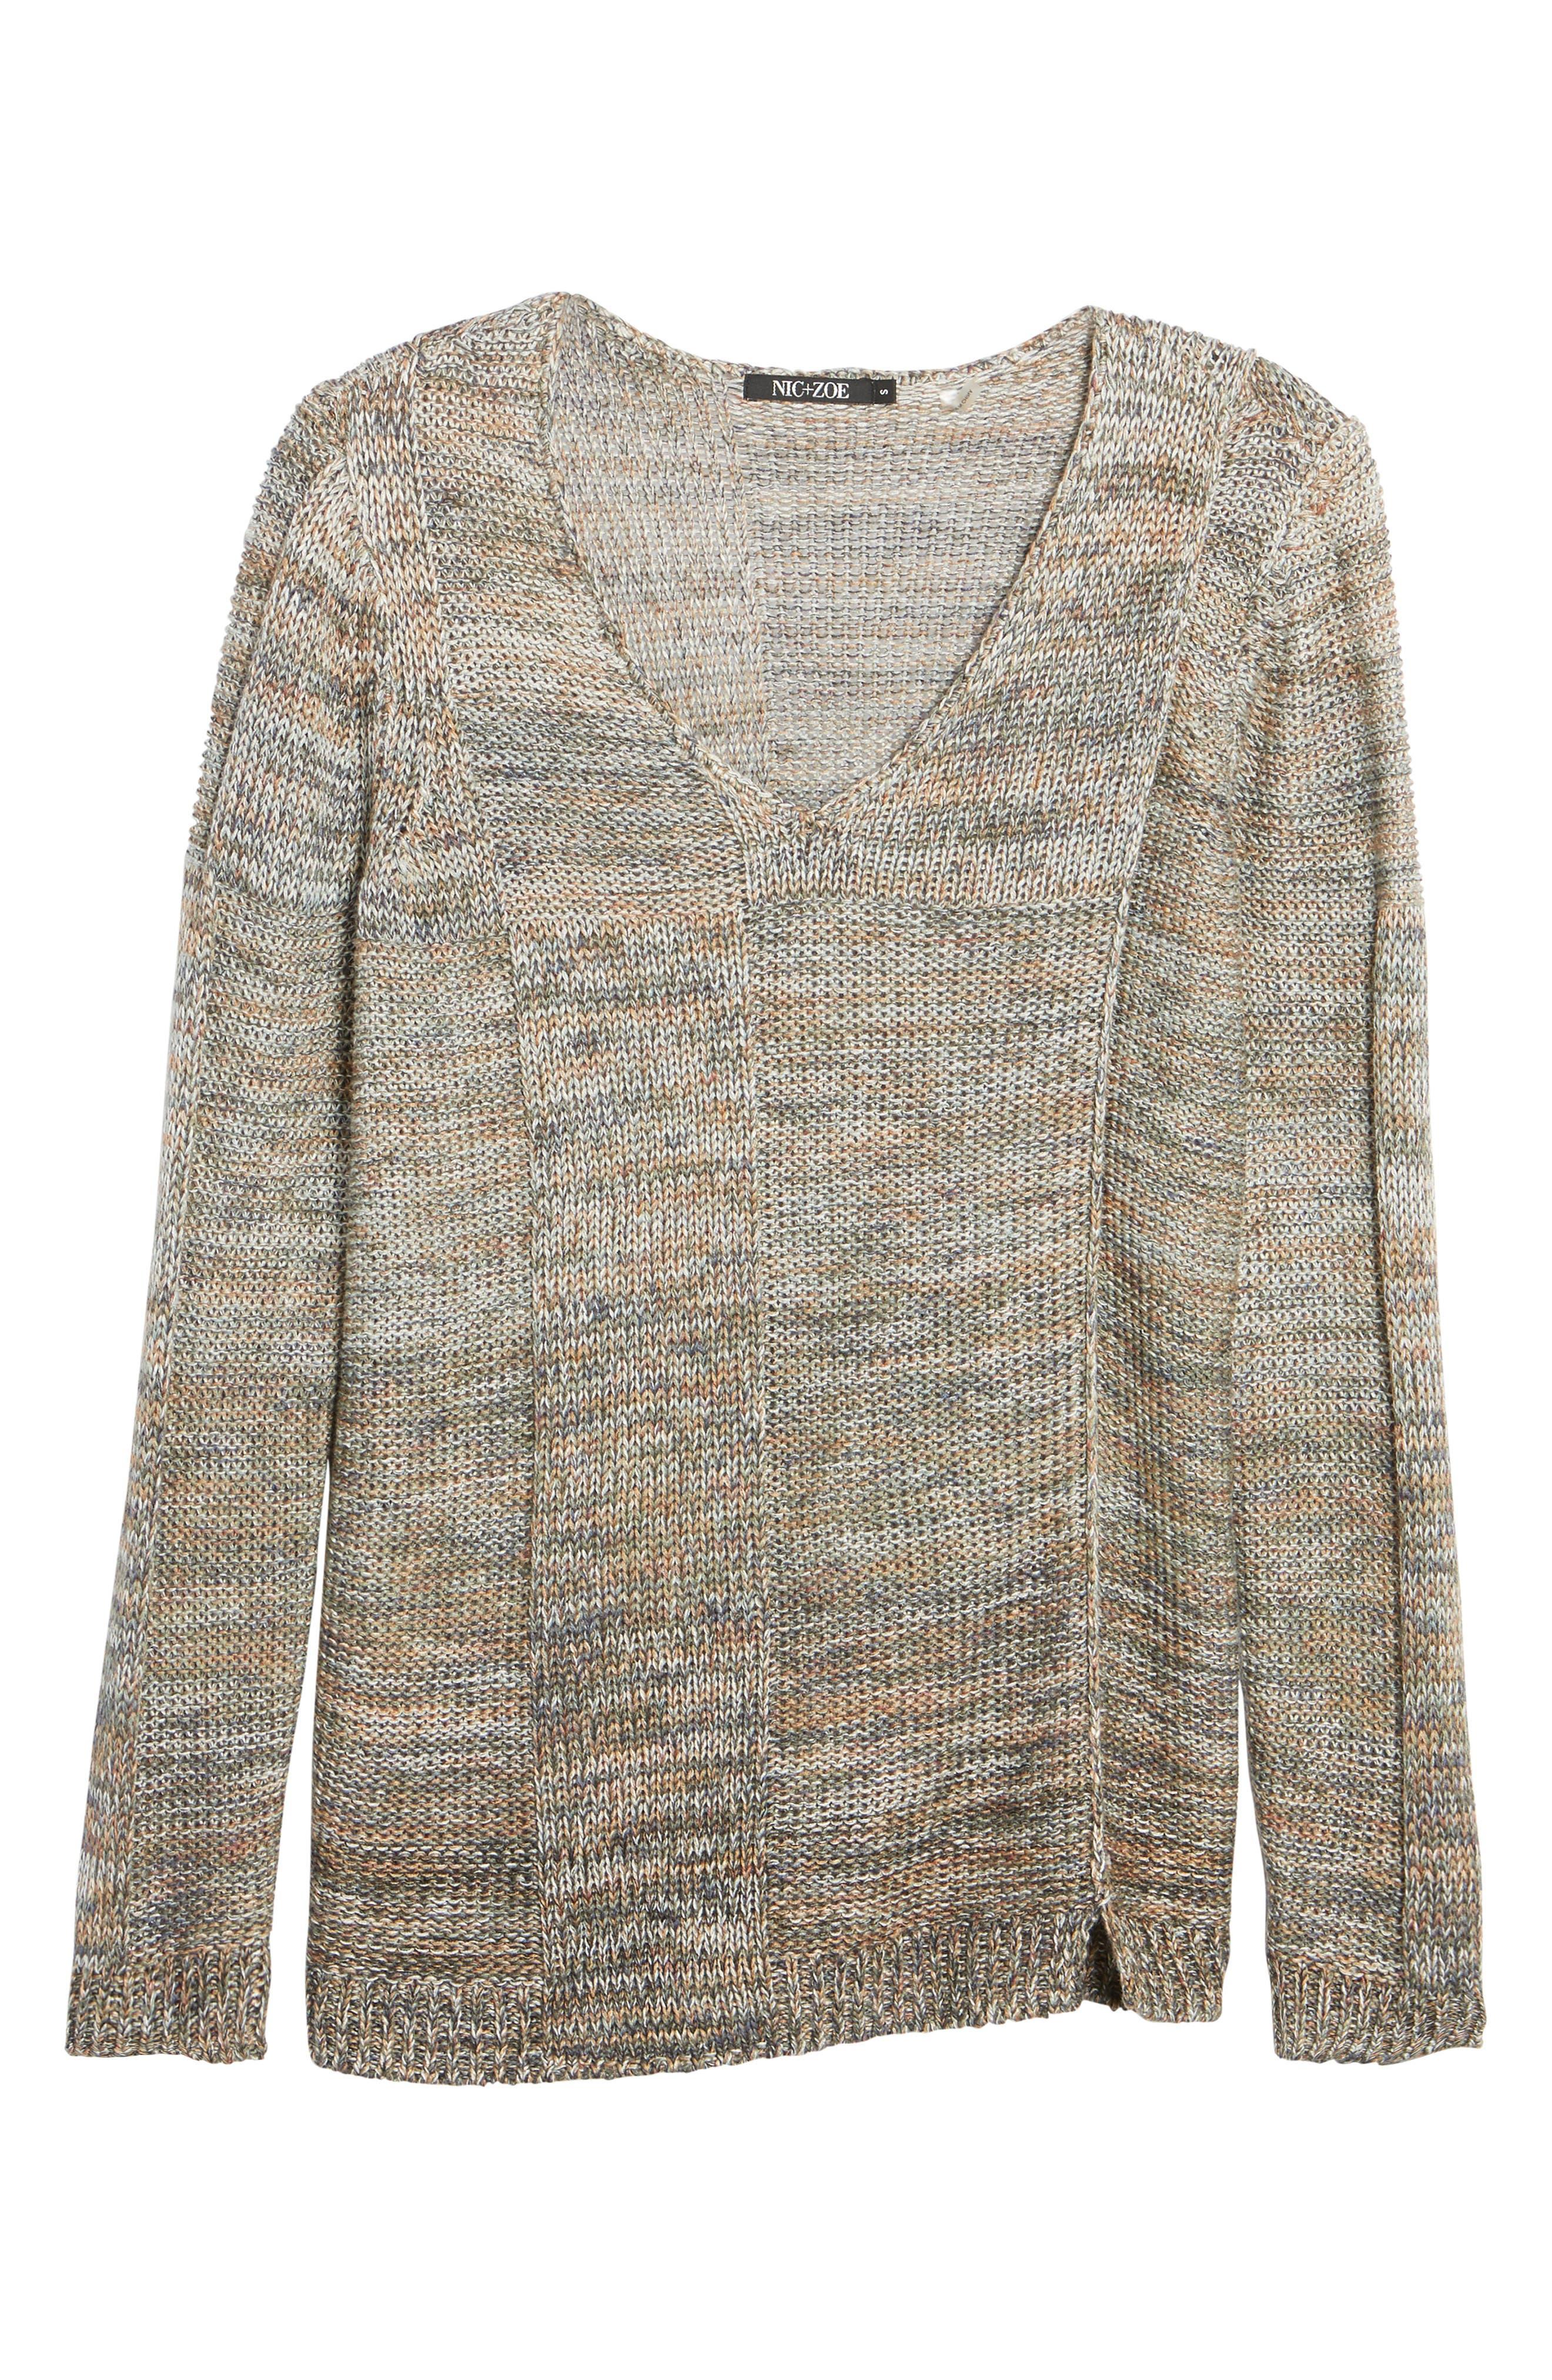 Textured Ombré Sweater,                             Alternate thumbnail 6, color,                             209